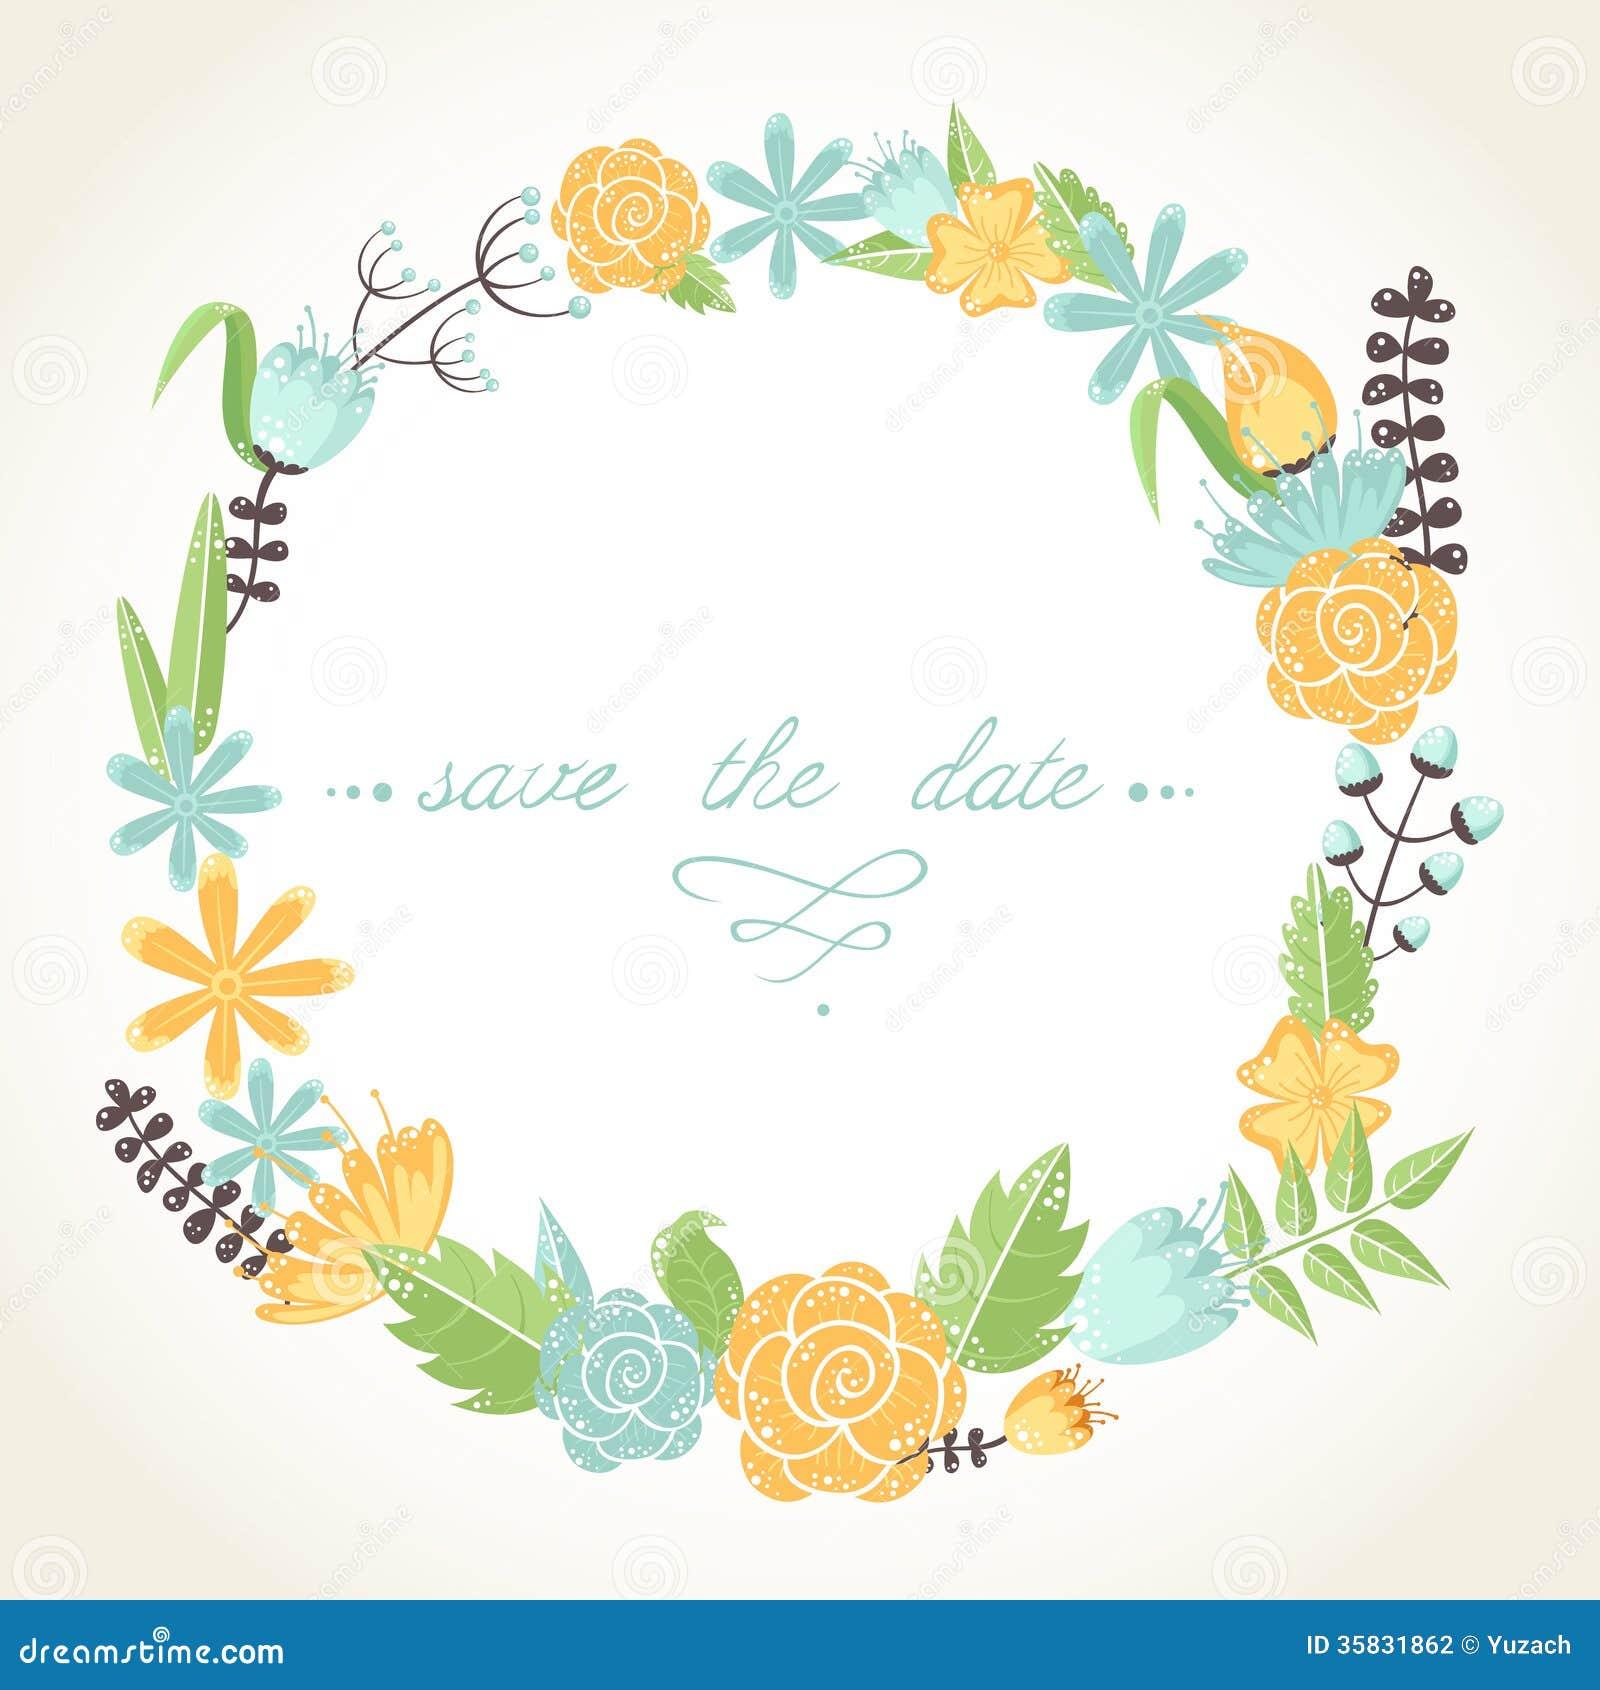 Elegant Floral Congratulation Card Stock Vector - Image: 35831862